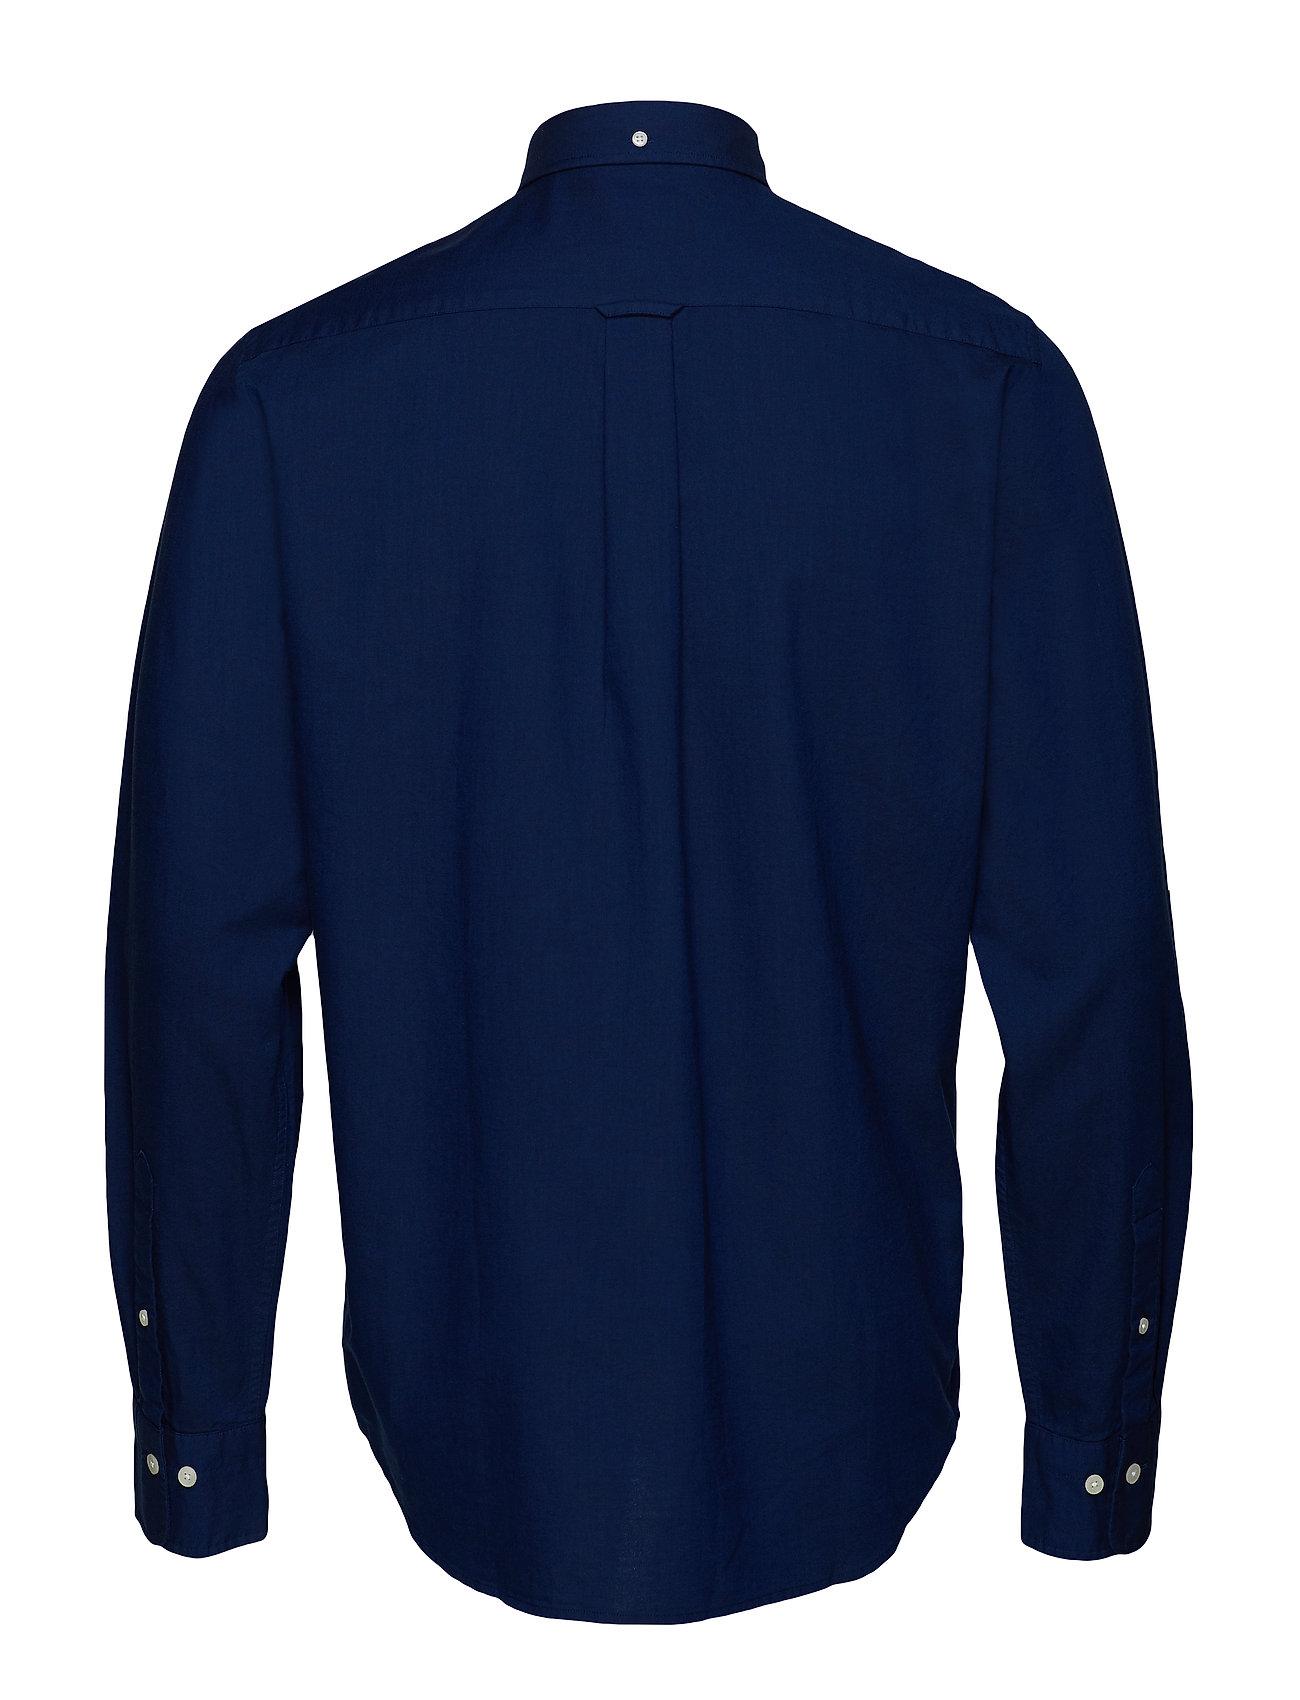 D1Oxford D1Oxford Bdpersian BlueGant D1Oxford Shirt Shirt BlueGant Bdpersian Shirt Reg Reg gf6yb7Y